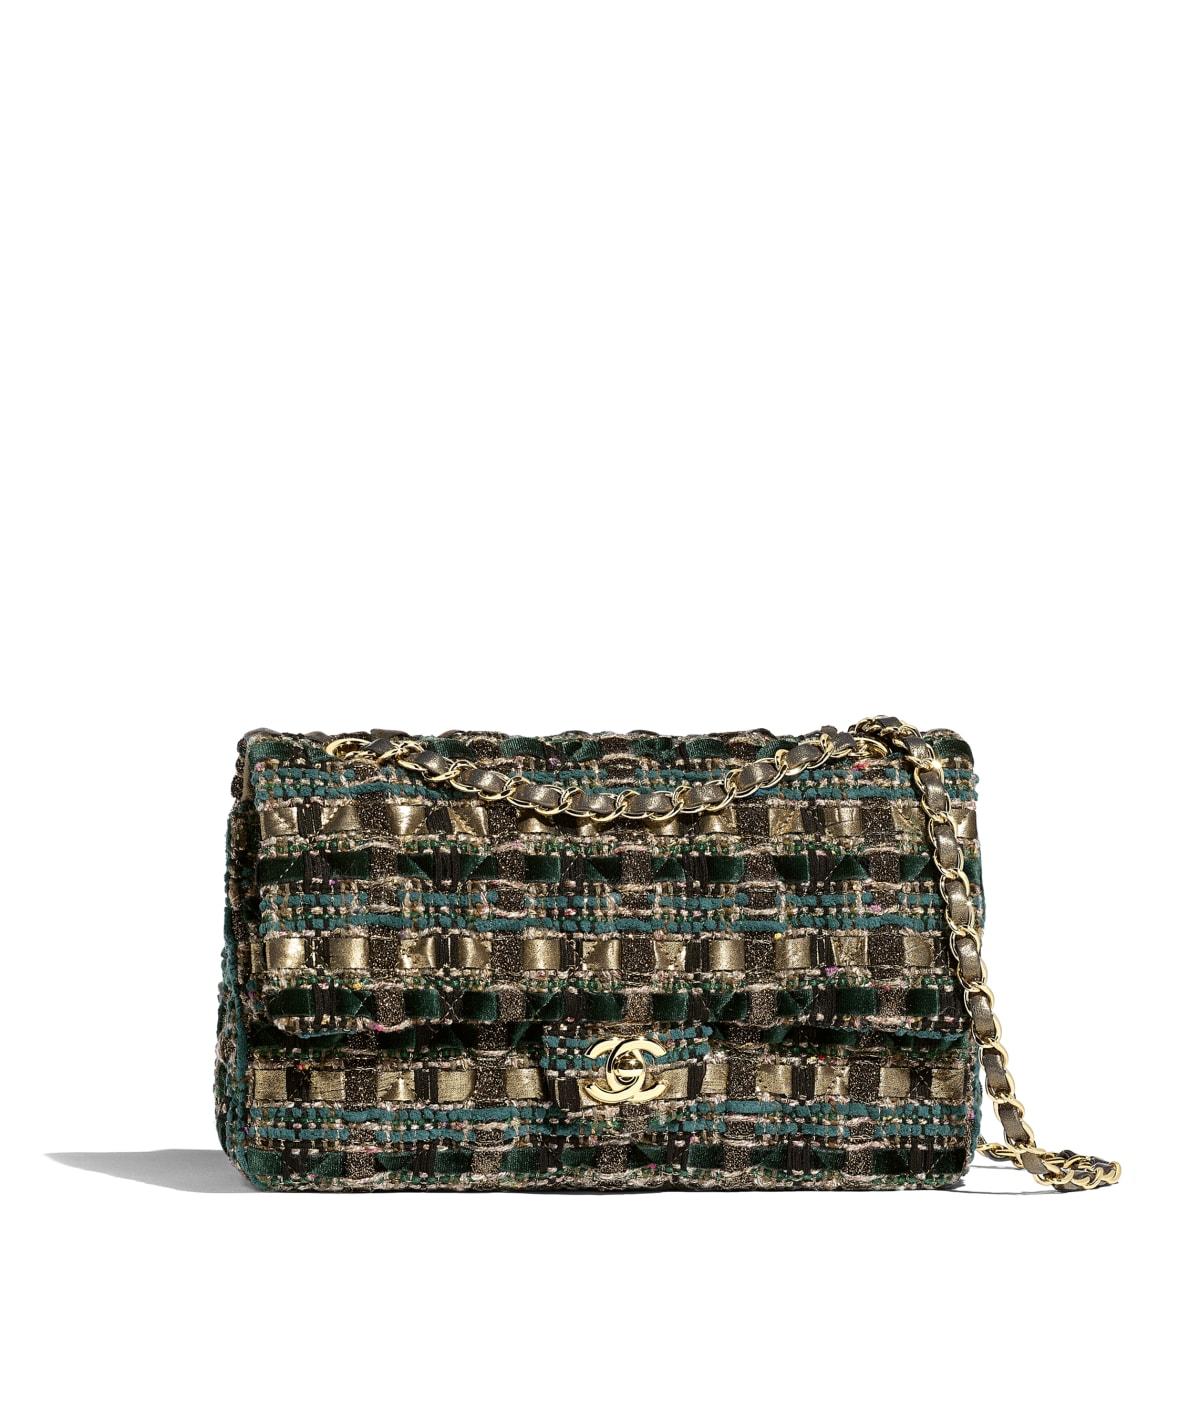 e186a18d08ac Classic Handbags - Handbags - CHANEL